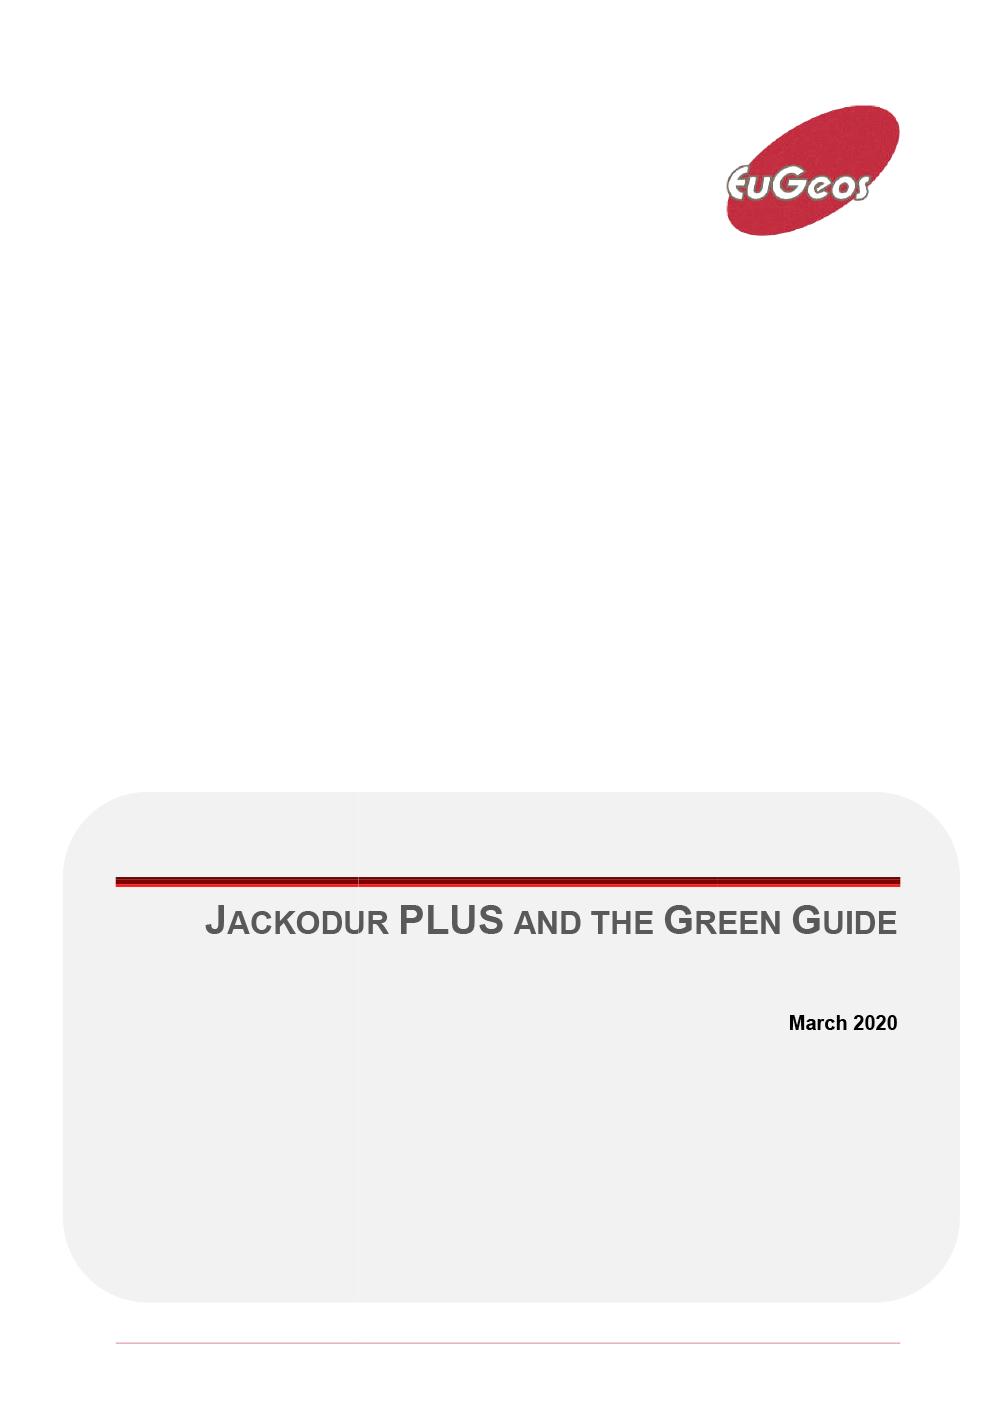 JACKODUR PLUS GREEN GUIDE RATING ANALYSIS